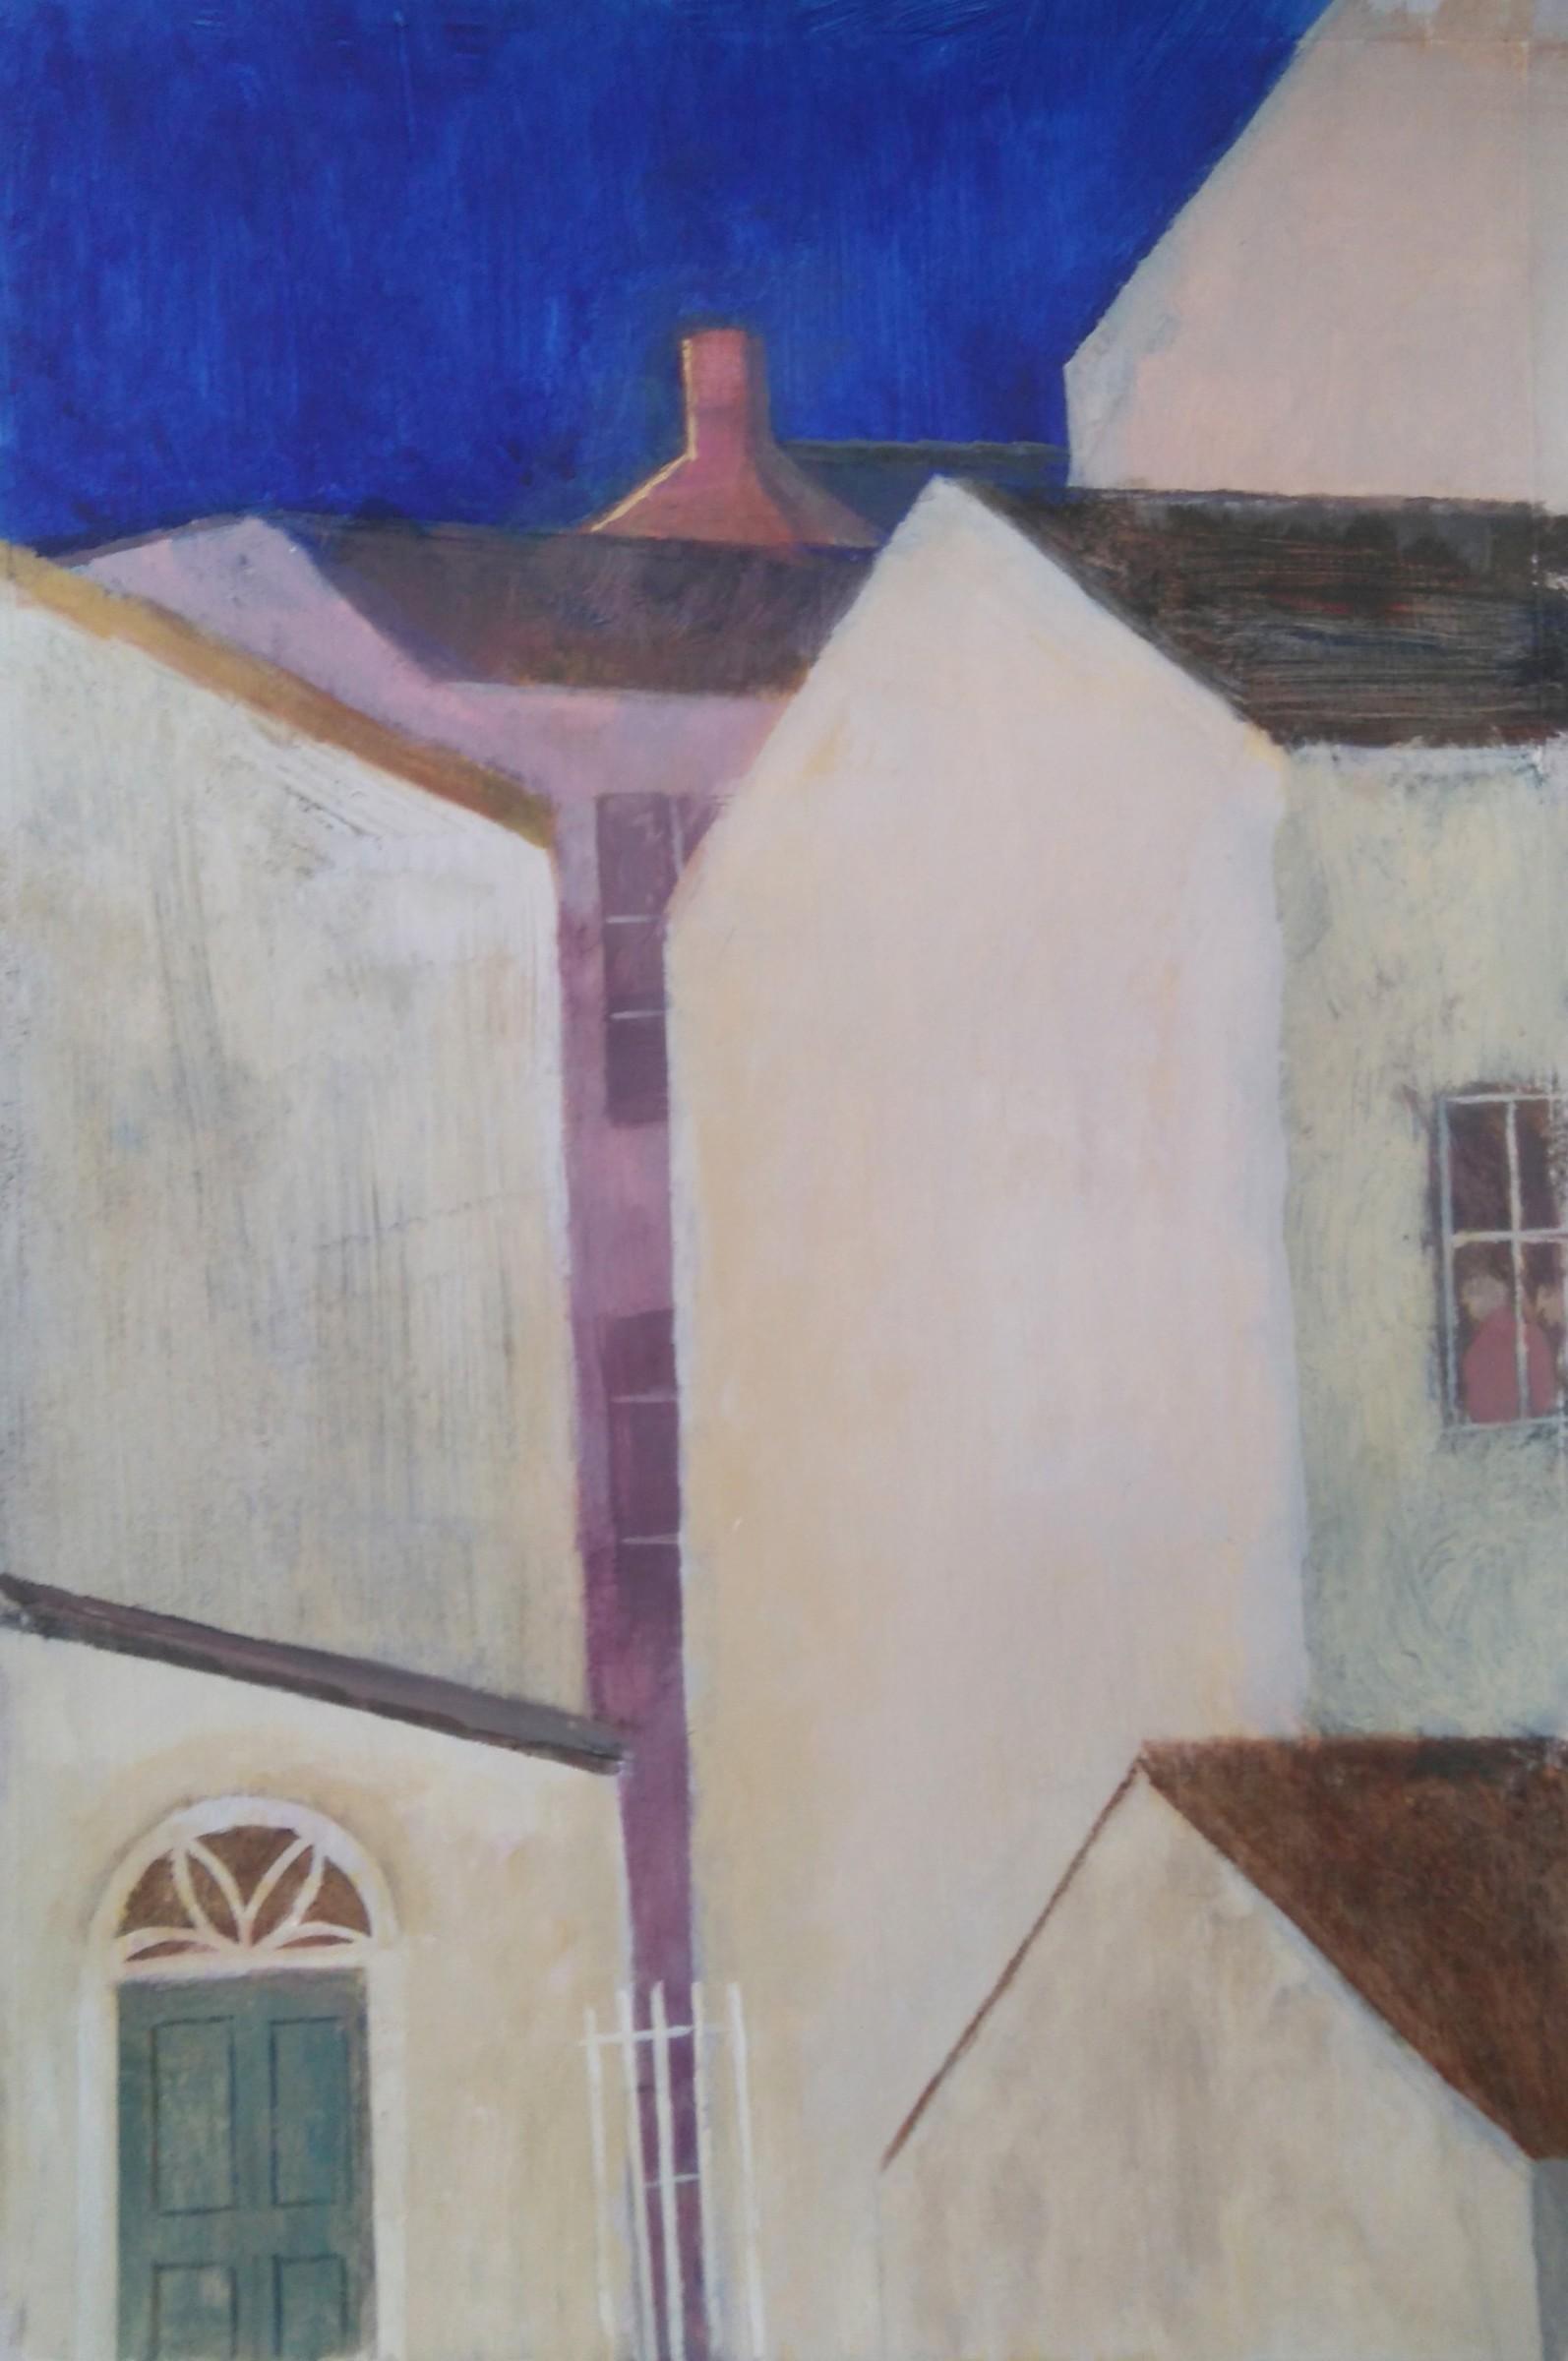 <span class=&#34;link fancybox-details-link&#34;><a href=&#34;/exhibitions/24/works/artworks_standalone10804/&#34;>View Detail Page</a></span><div class=&#34;artist&#34;><span class=&#34;artist&#34;><strong>Richard Sorrell</strong></span></div><div class=&#34;title&#34;><em>Town Houses</em></div><div class=&#34;medium&#34;>acrylic</div>